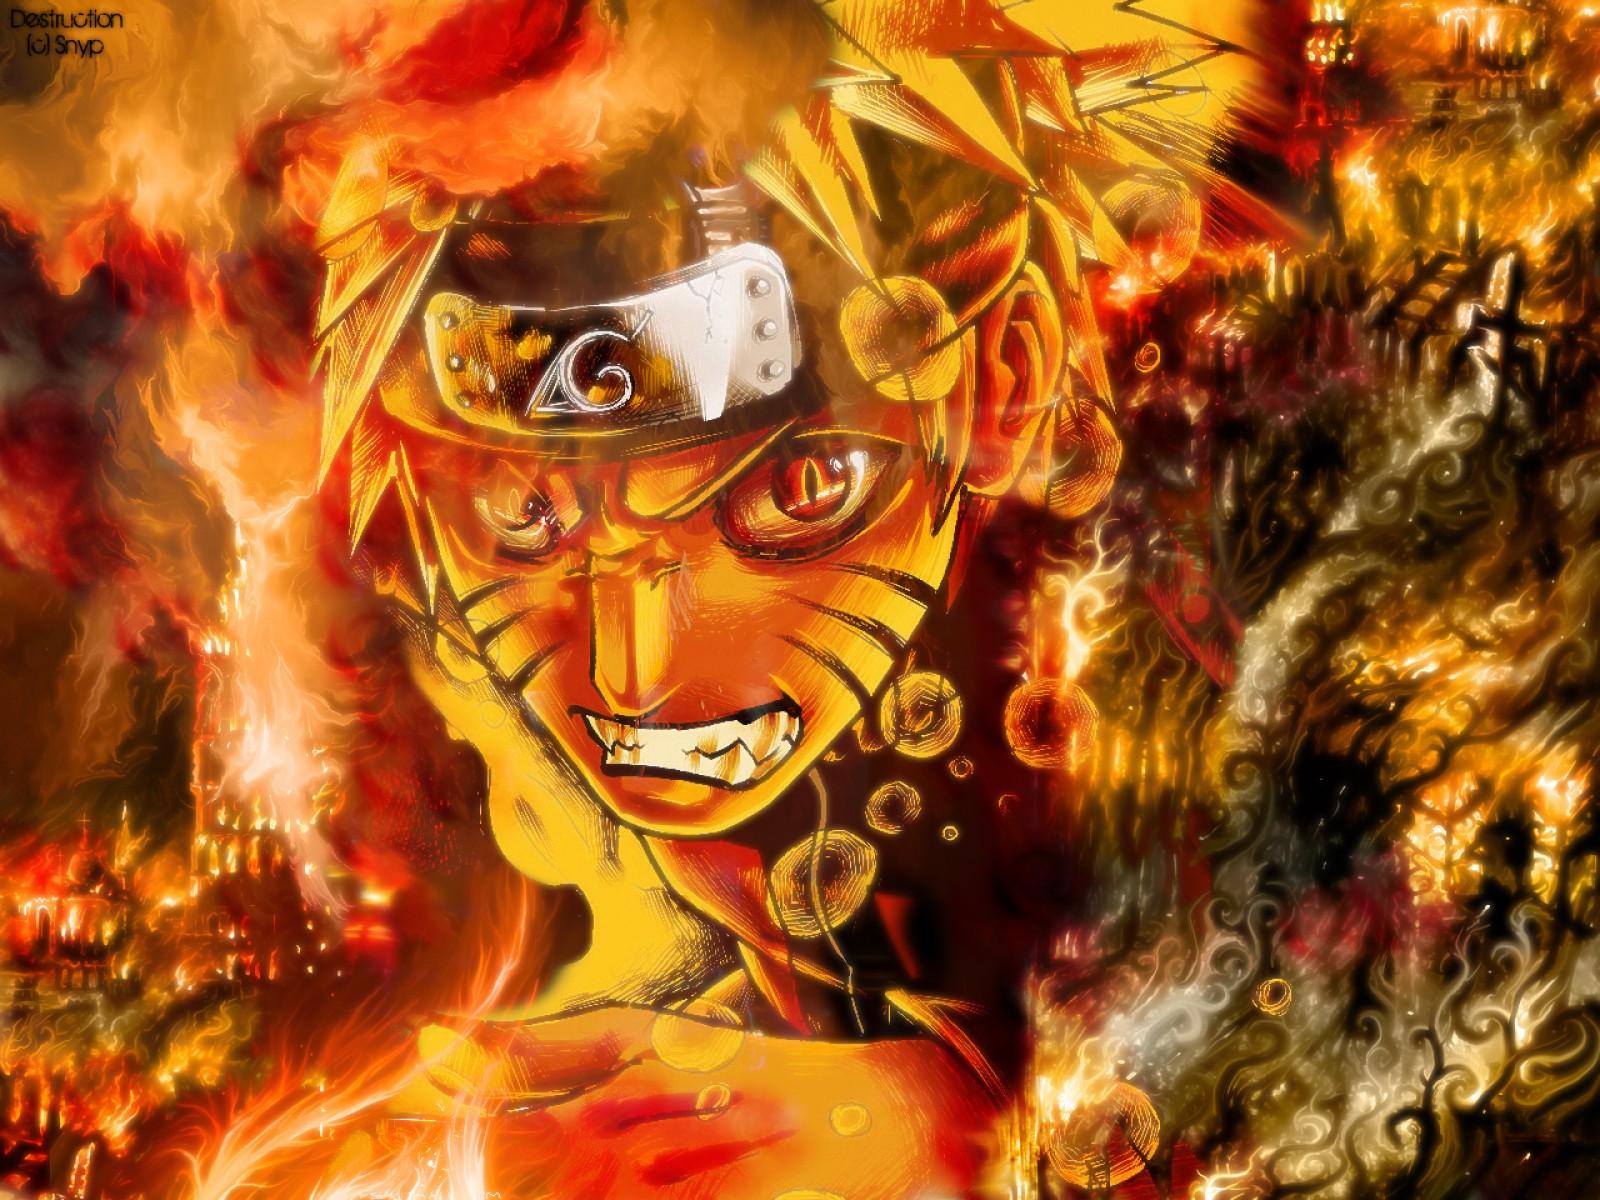 Beautiful Wallpaper Naruto Top - The-best-top-hd-desktop-naruto-shippuden-wallpaper-naruto-shippuden-wallpapers-hd-8  2018.jpg